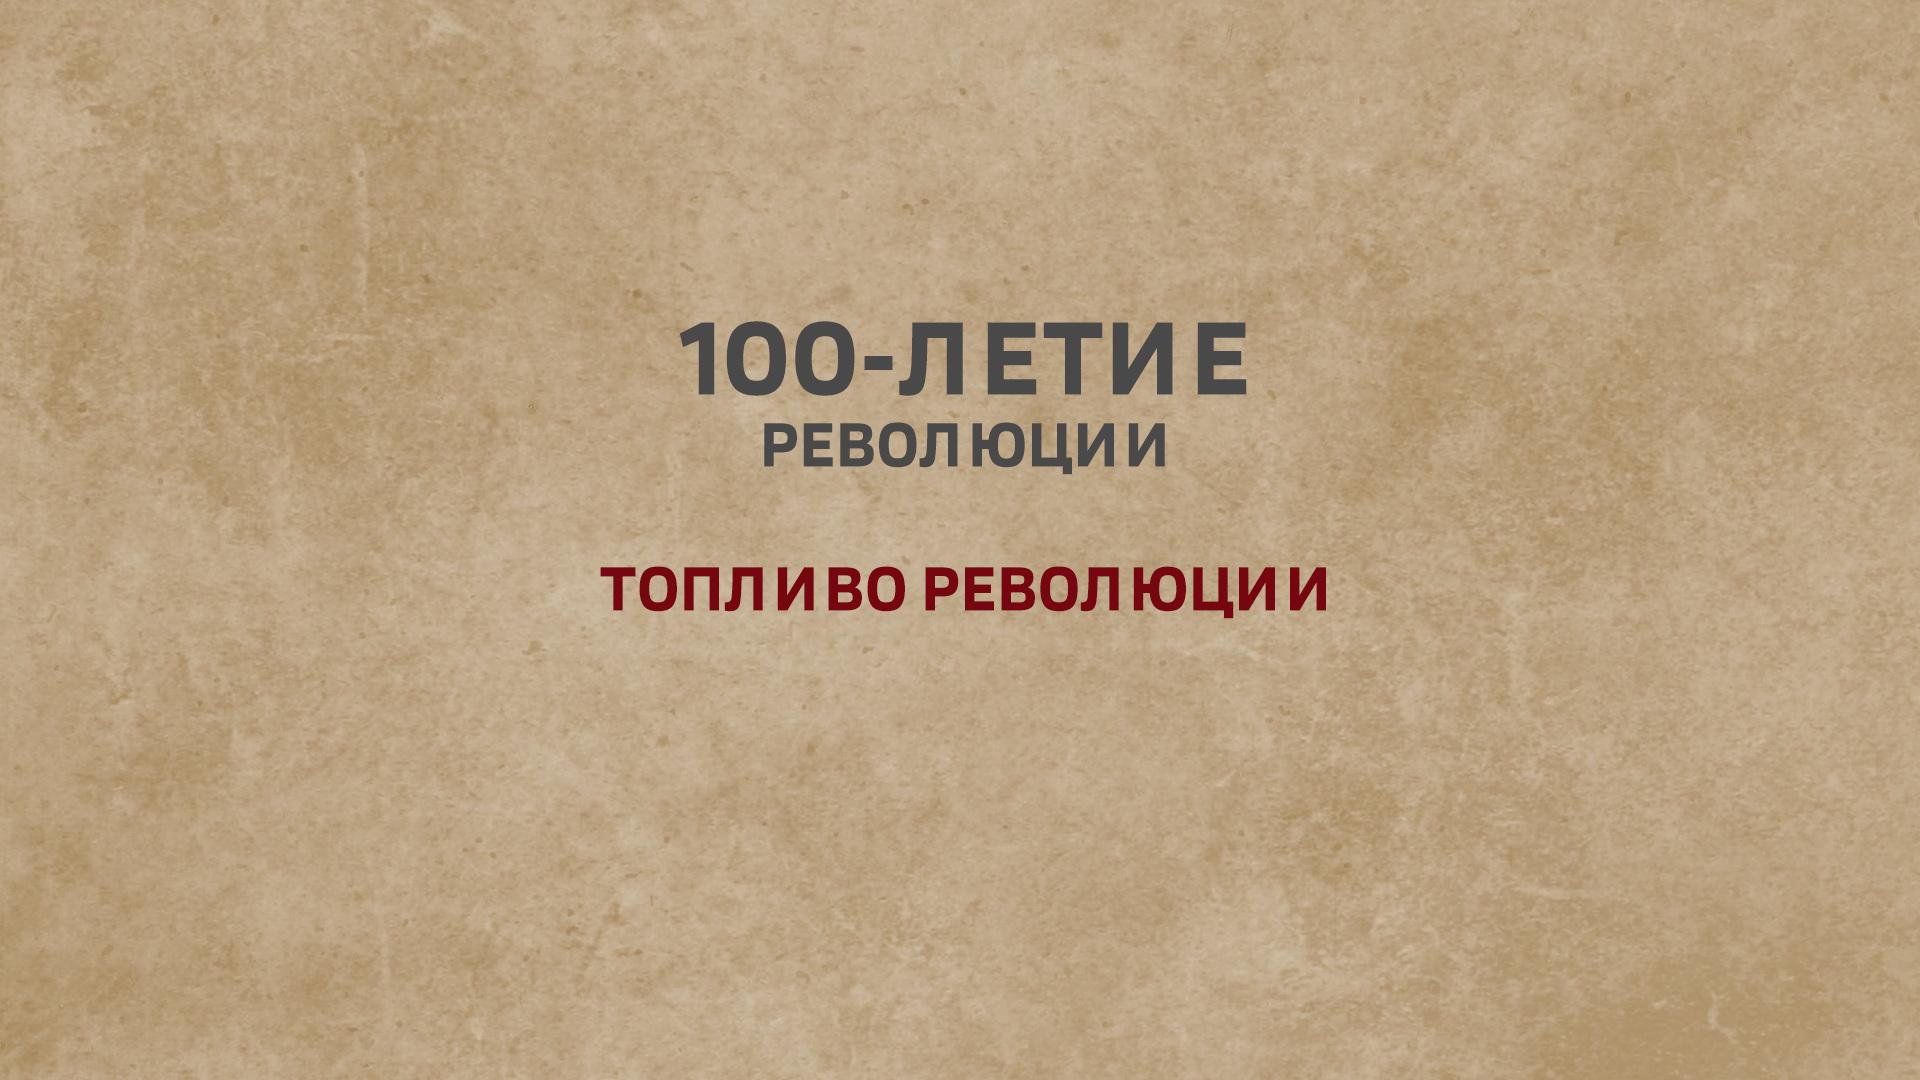 100-летие революции. Топливо революции